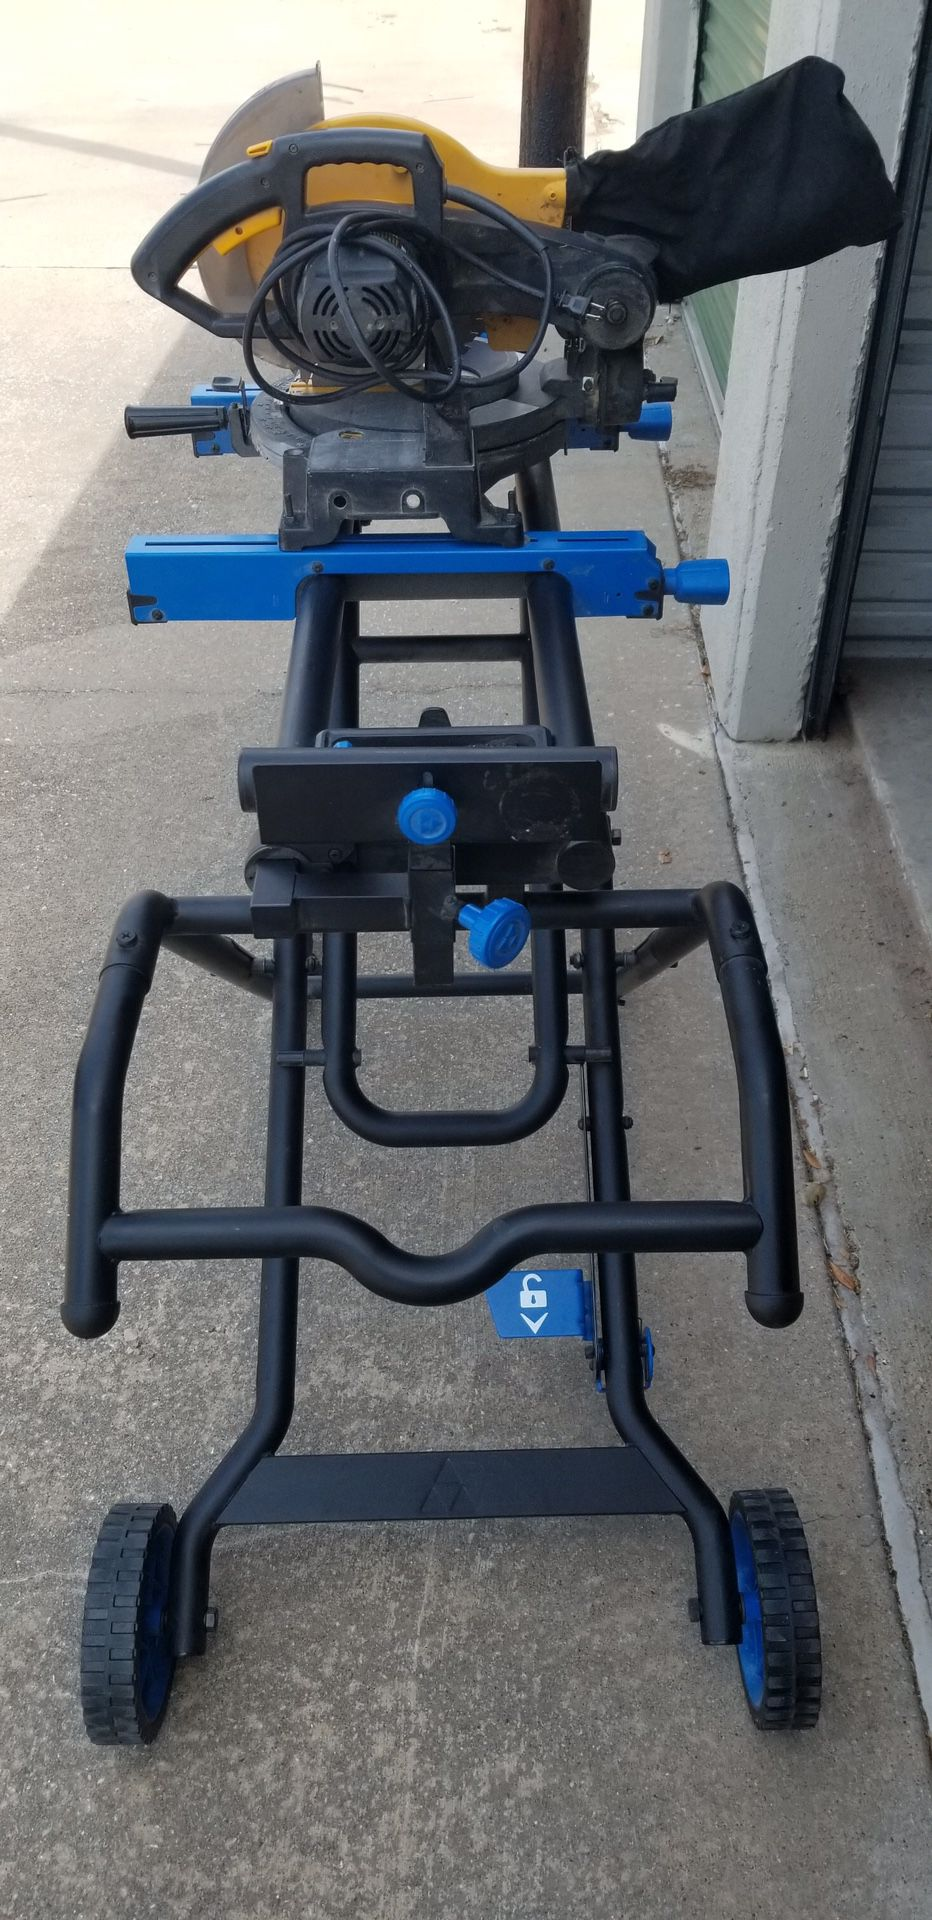 "Delta Portable Work Station W/ 10"" Pro-Tech Compound Miter Saw"